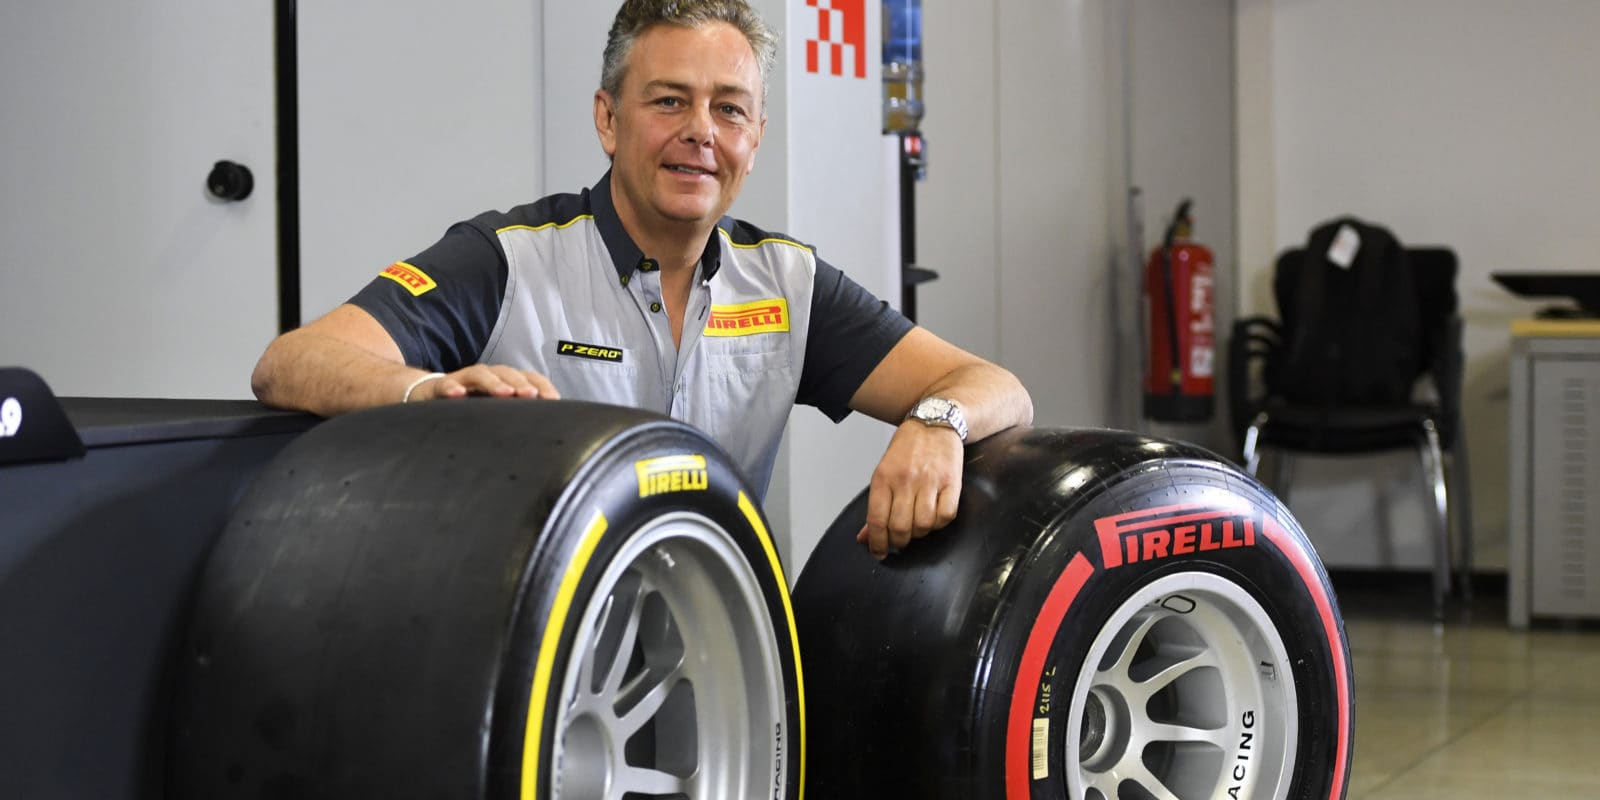 Pirelli je schopno nominovat pneumatiky pro rok 2020